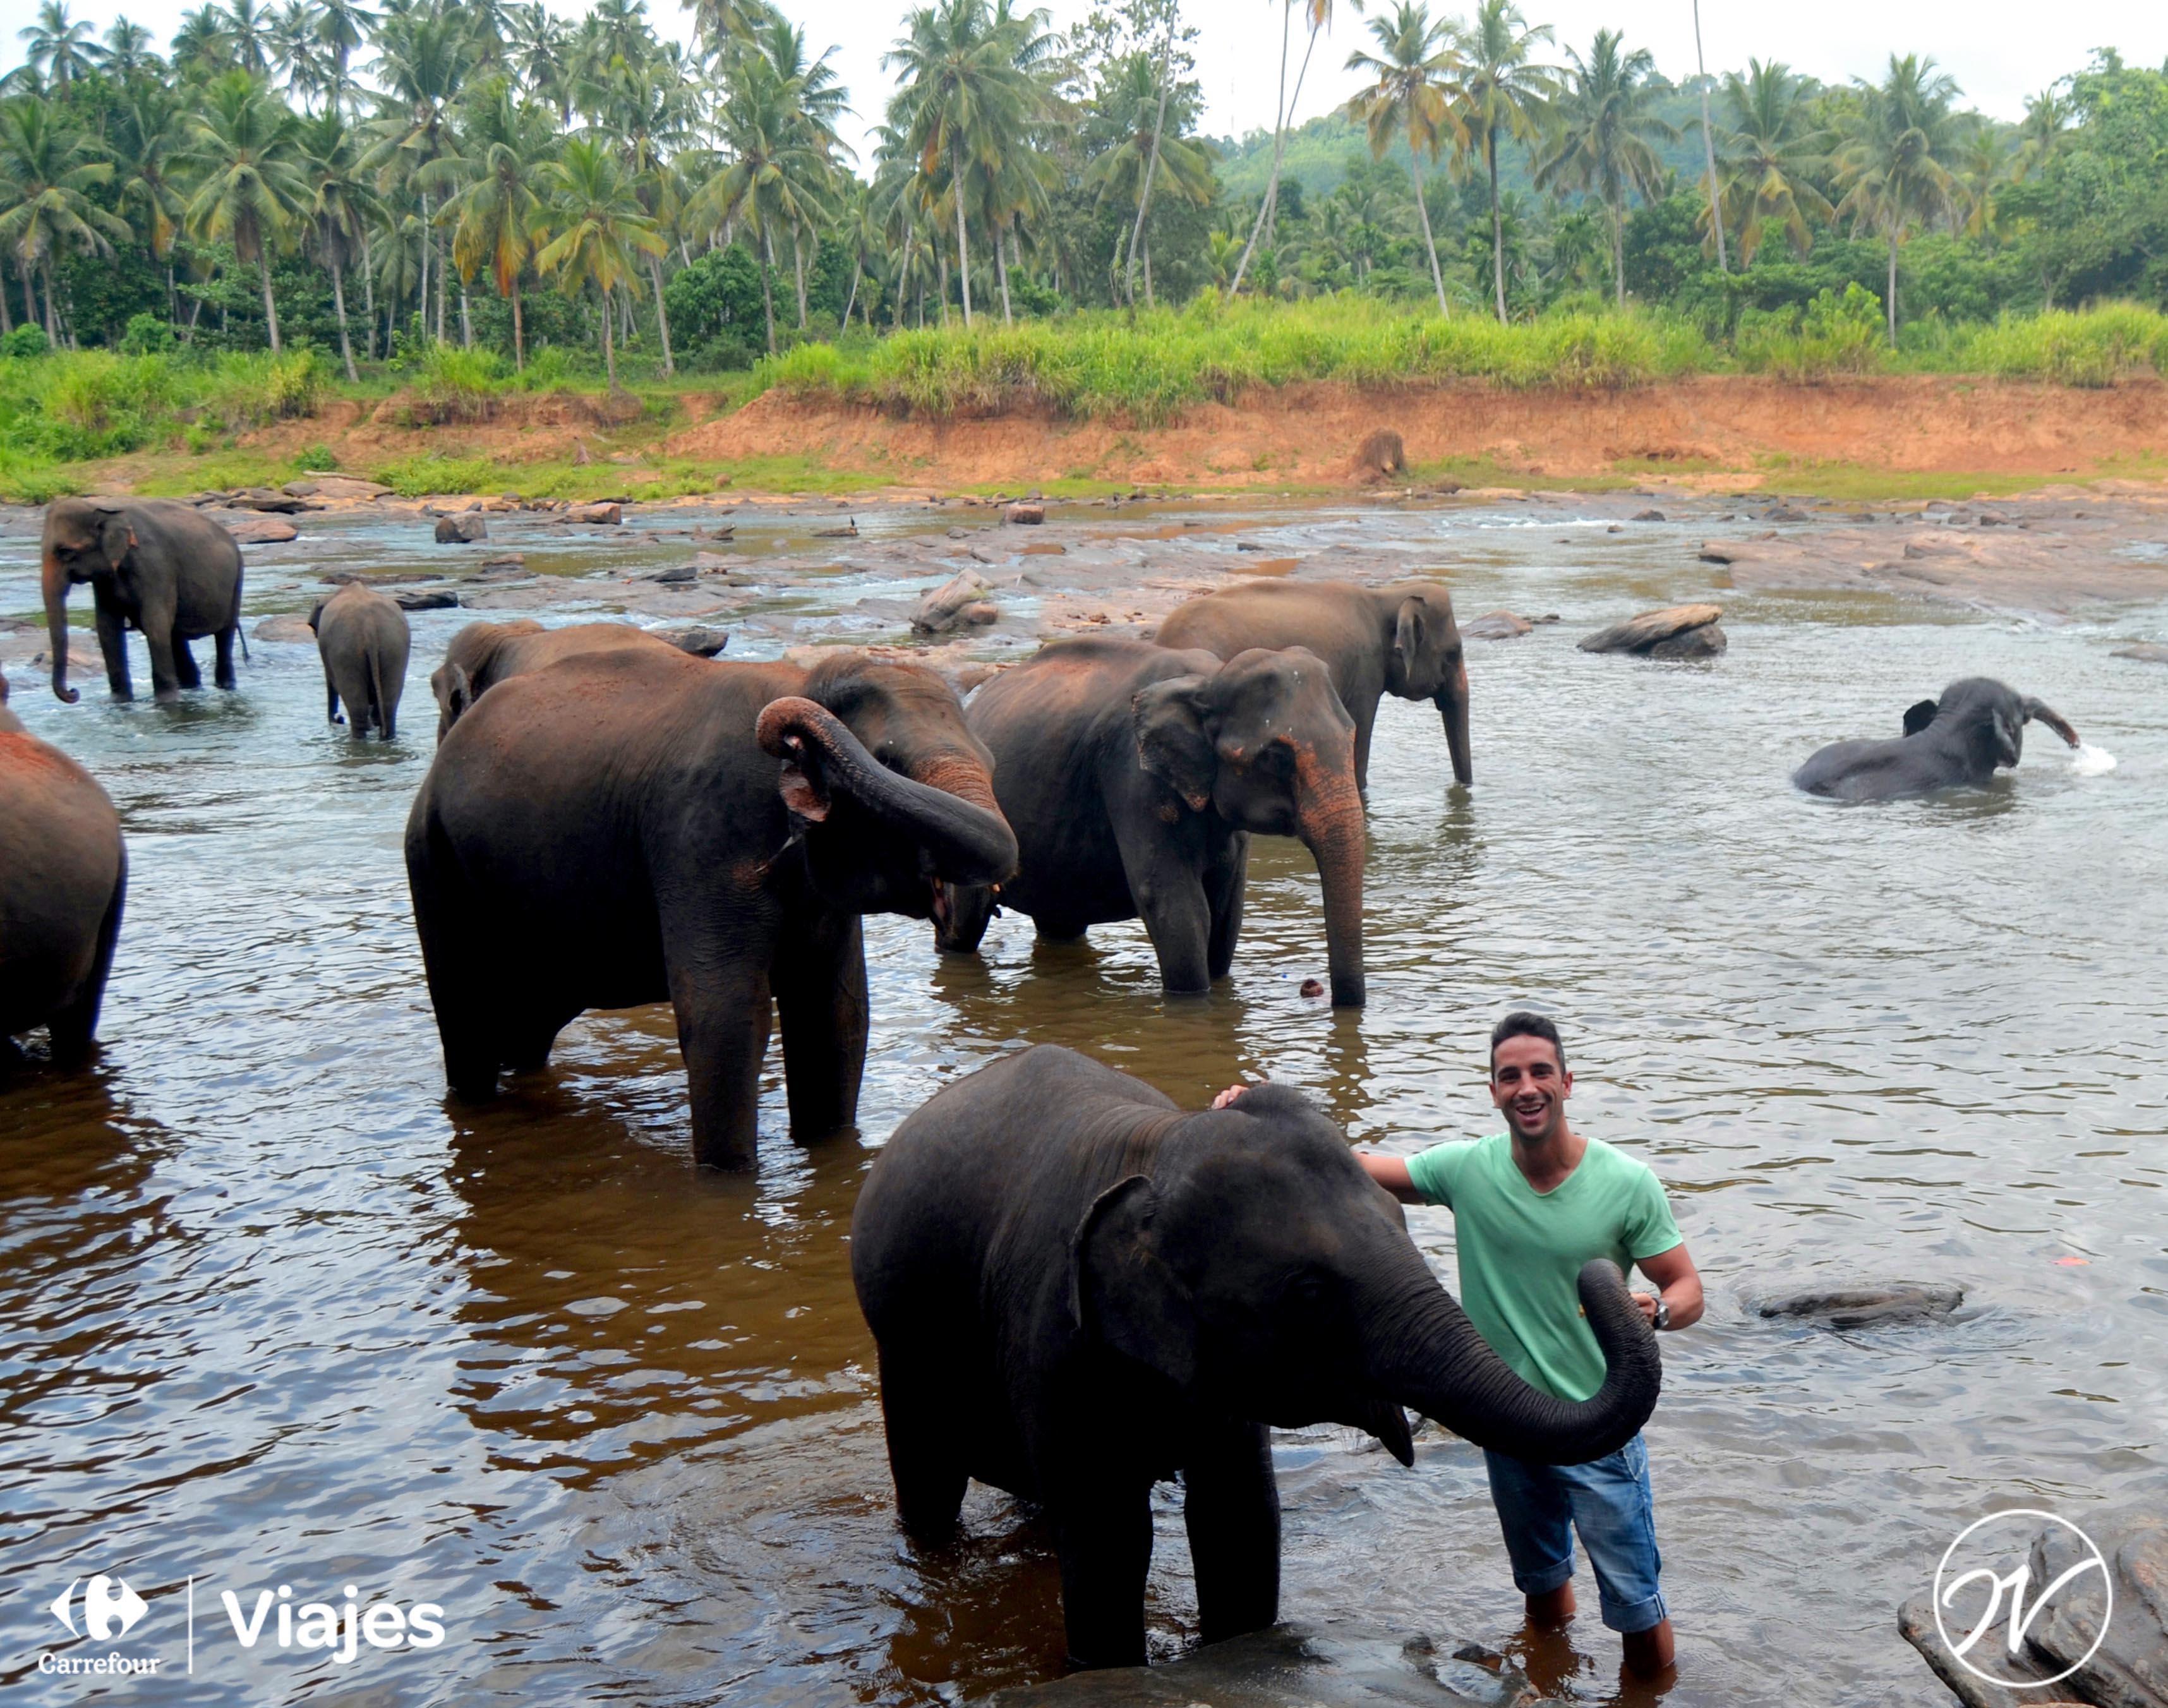 Aventuhero, Sri Lanka - Bañando a los elefantes en el Orfanato de elefantes